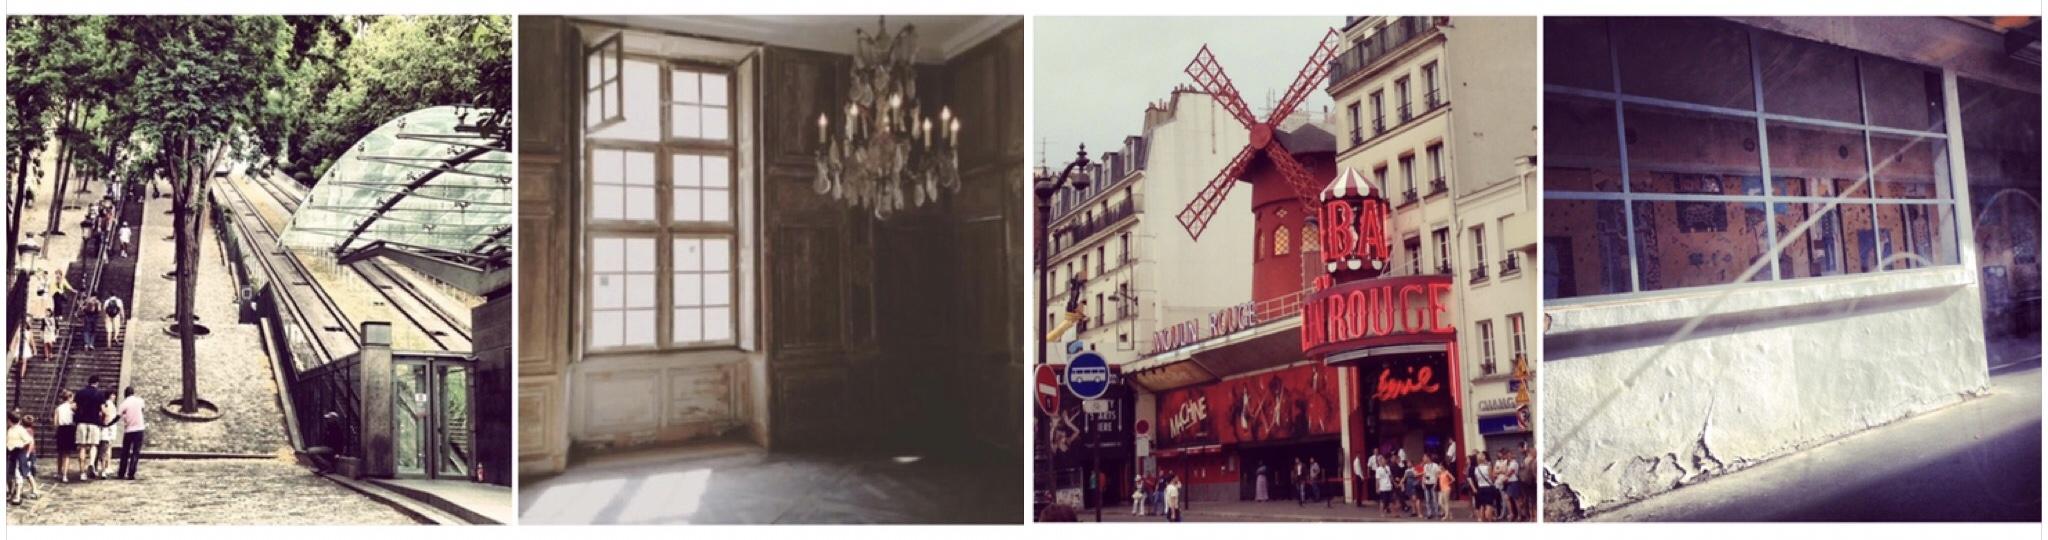 Paris Play